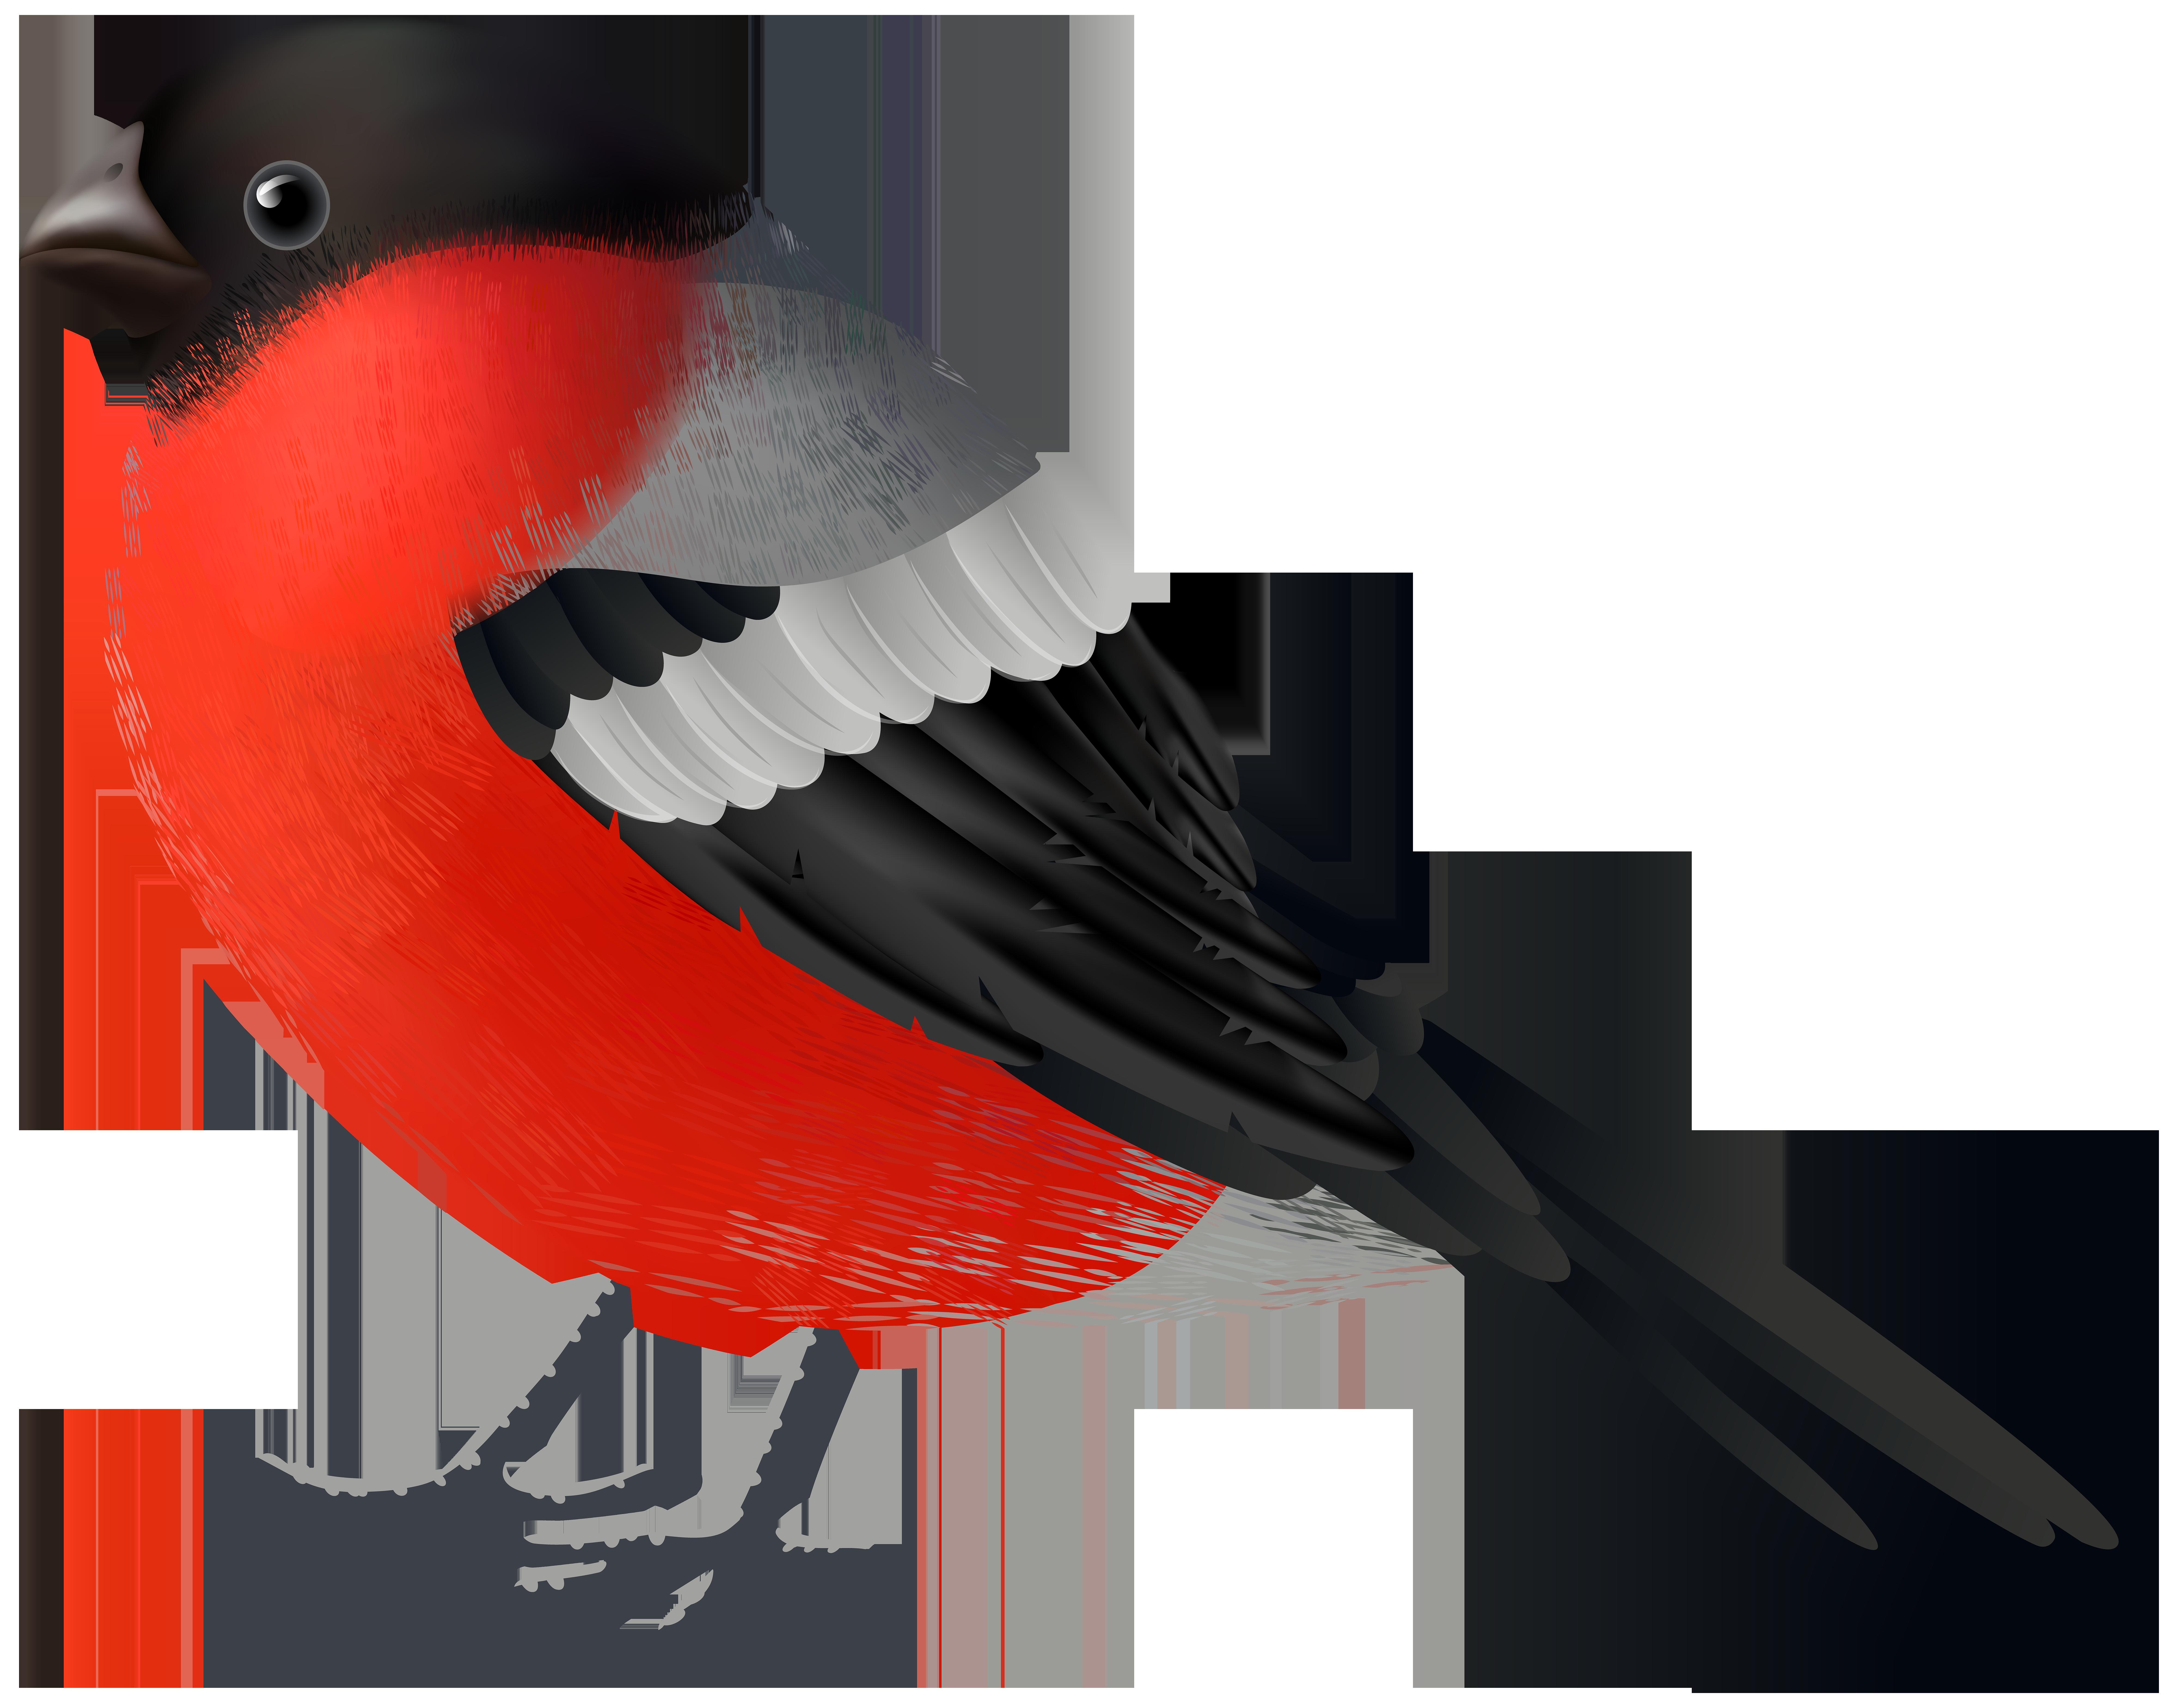 Red black bird png. Cardinal clipart transparent background